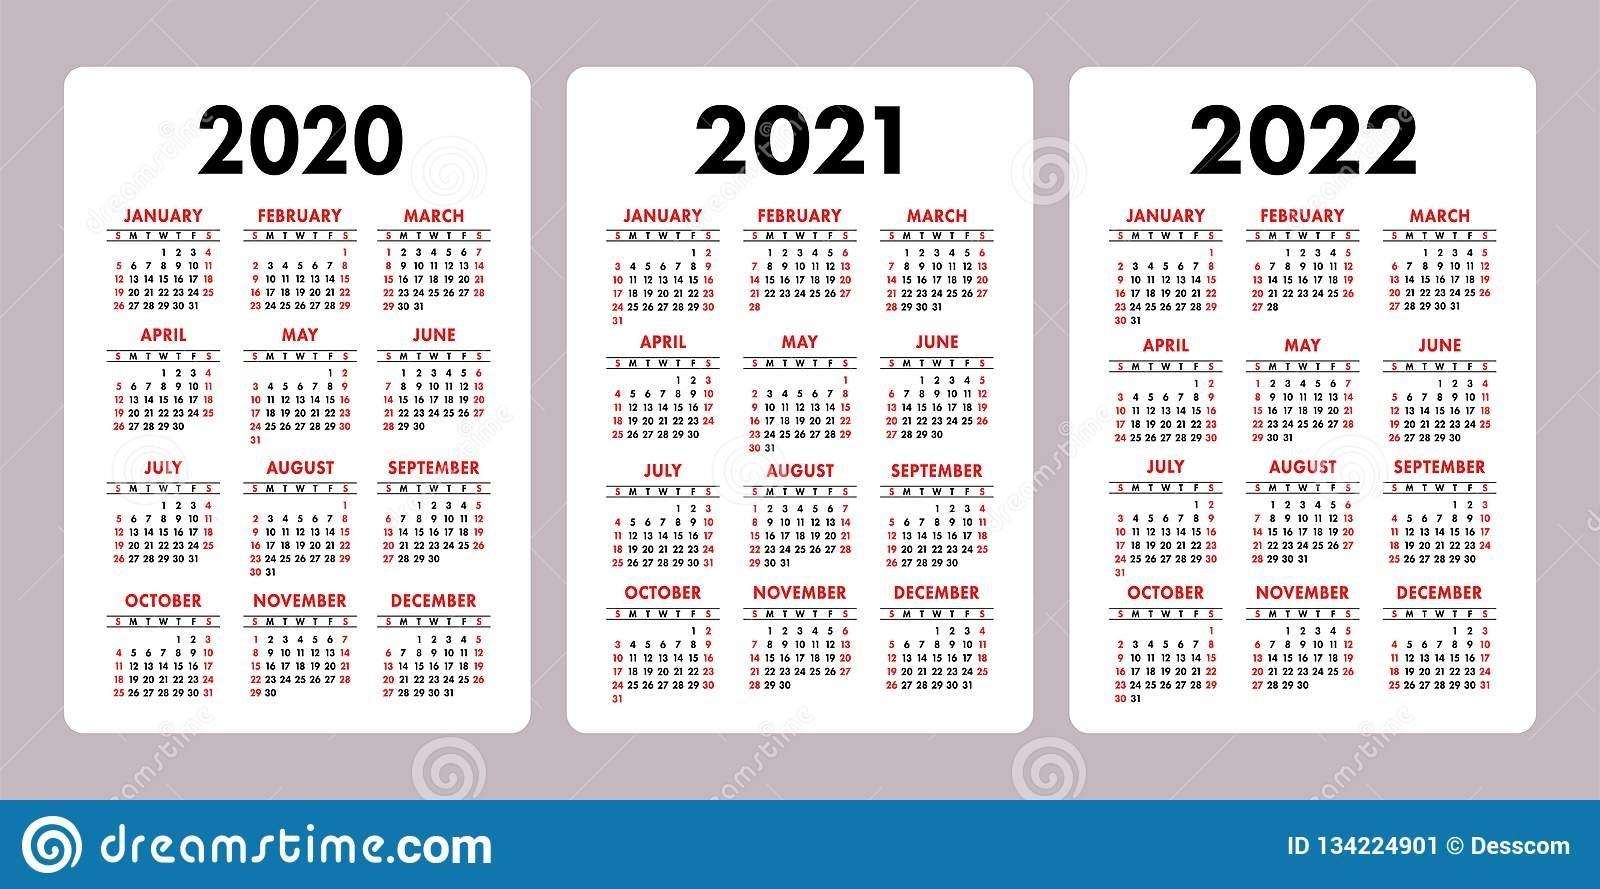 Calendars In 2020 2021 And 2022 - Calendar Inspiration Design